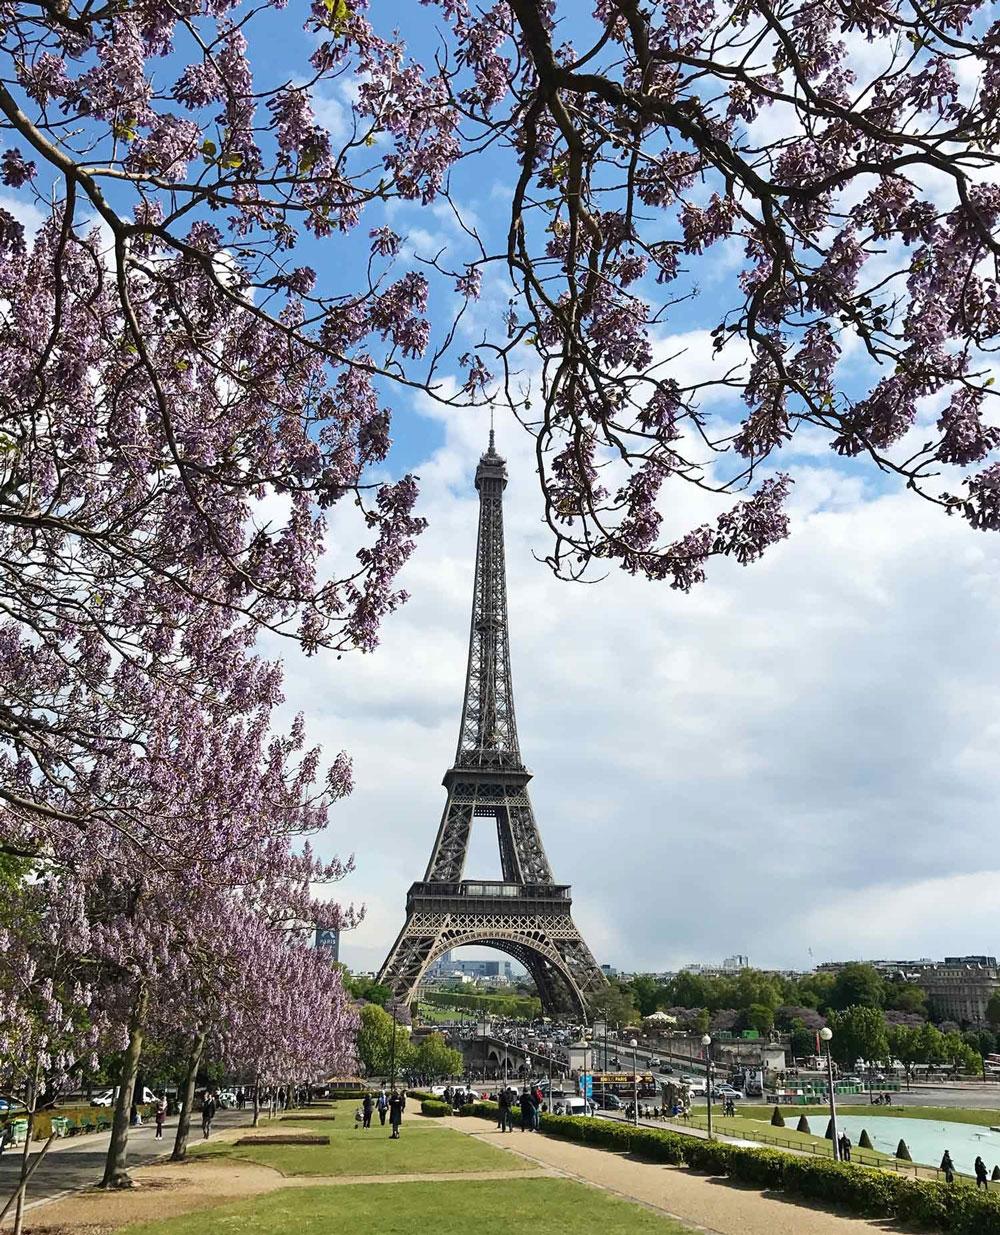 The Eiffel Tower. December 2018